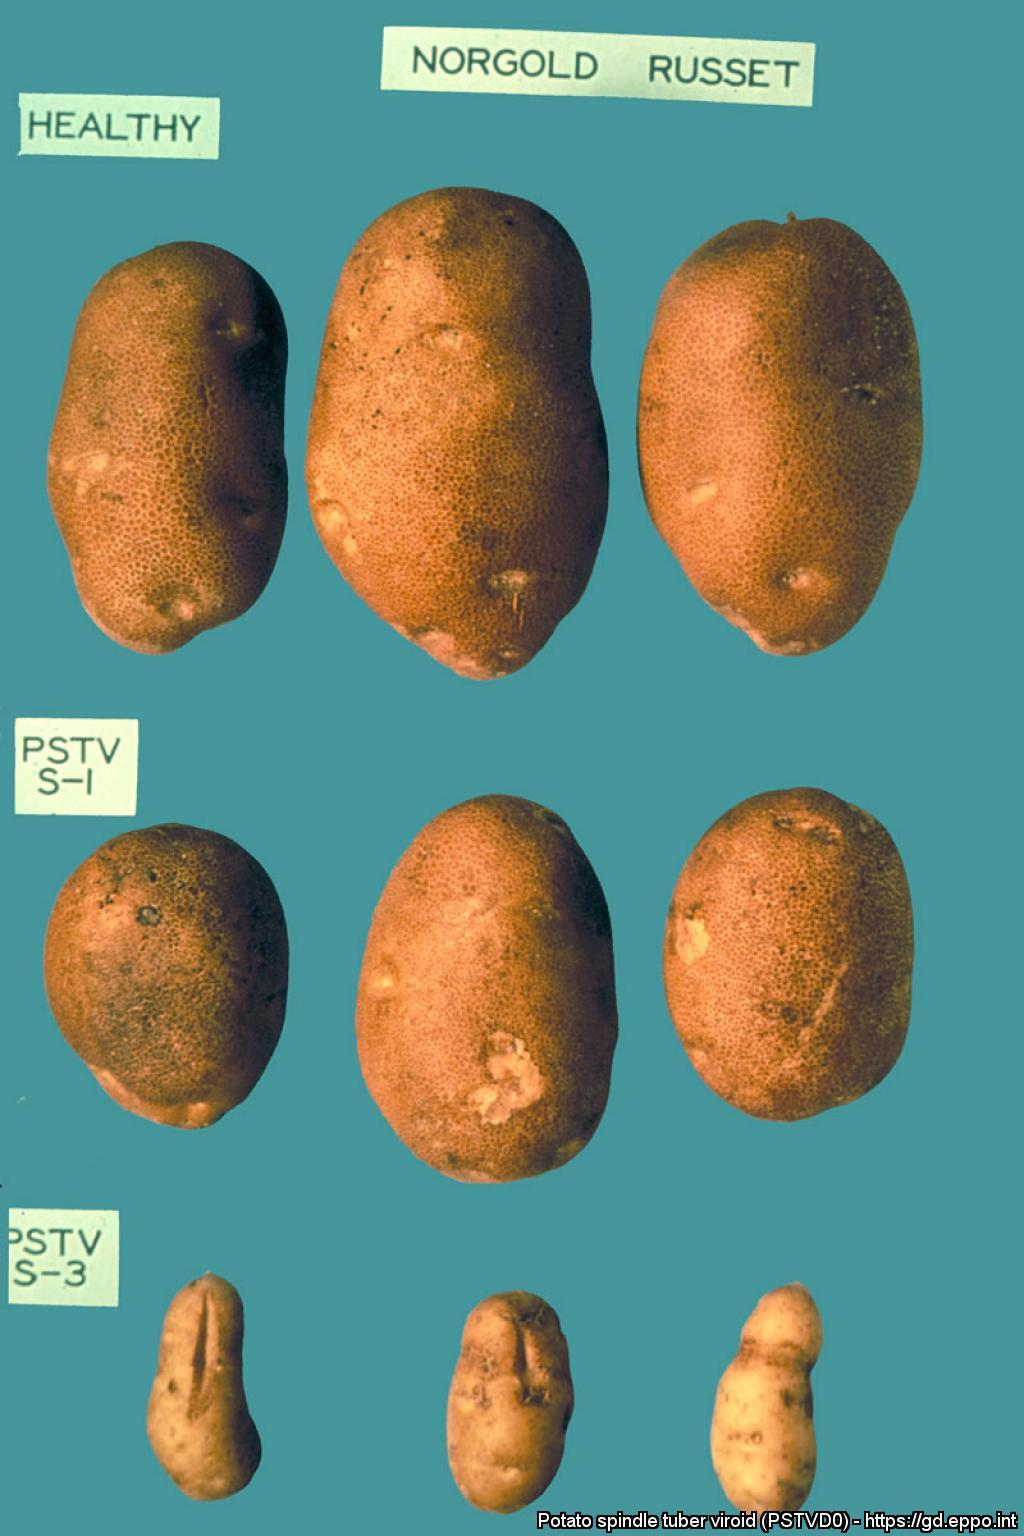 potato spindle tuber viroid  pstvd0  photos